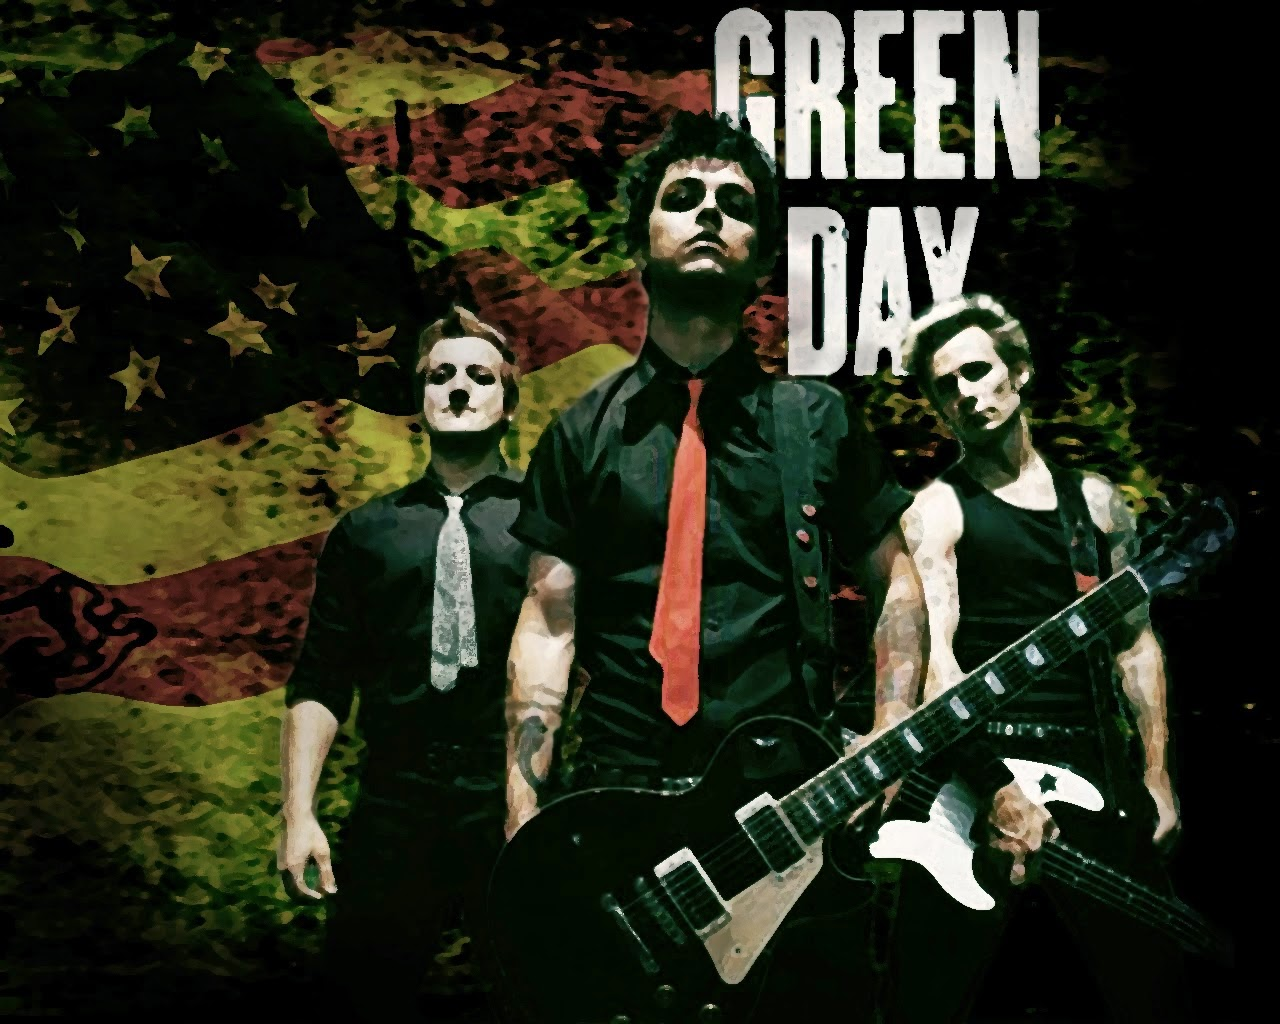 chord gitar green day 21 guns gagas rockers. Black Bedroom Furniture Sets. Home Design Ideas